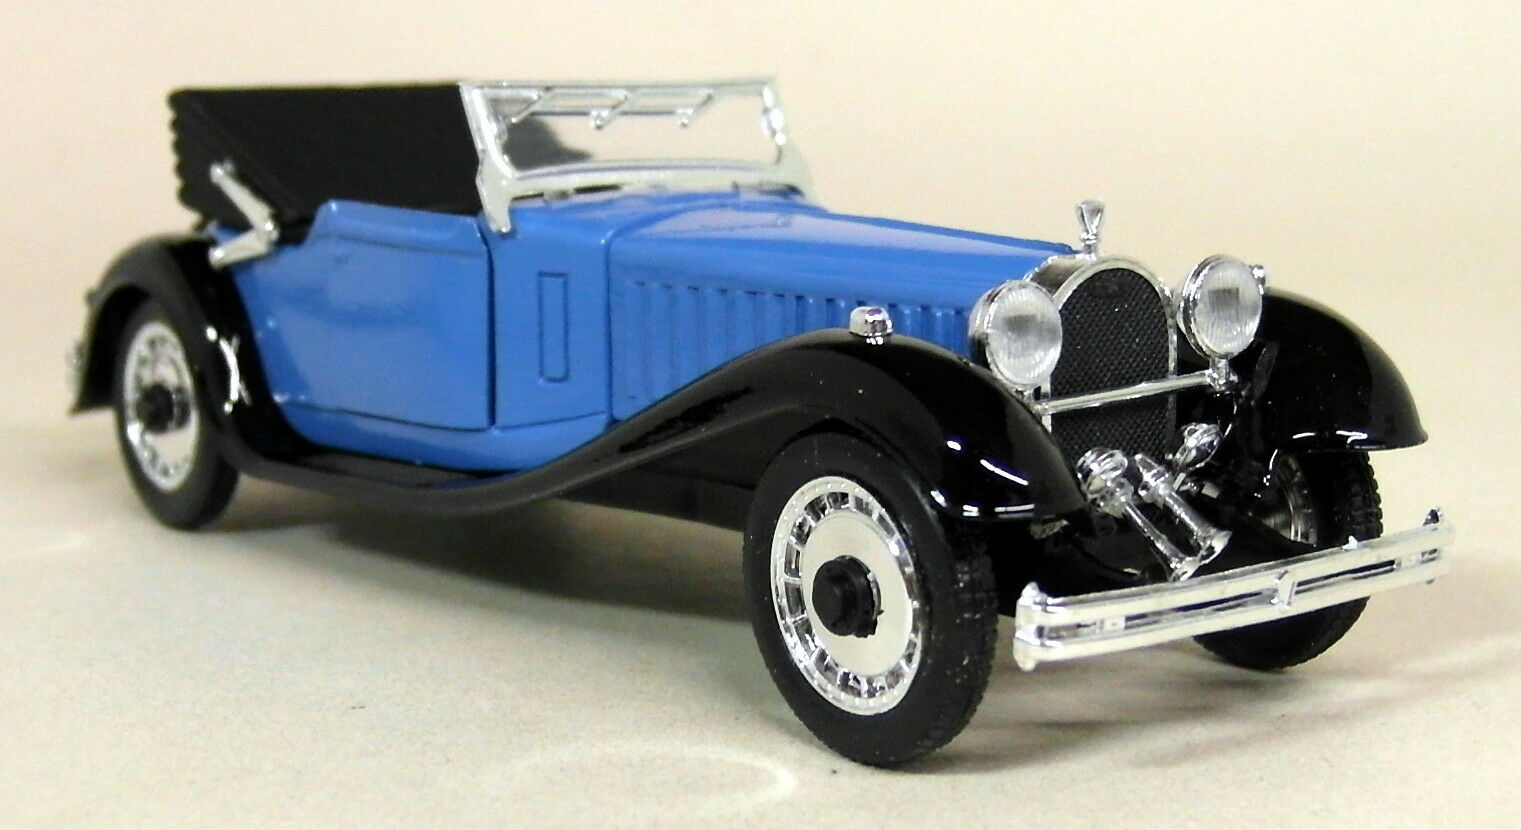 Rio 1 43 Scale - 37 1927 Bugatti Bugatti Bugatti Royale Mod 41 Scoperta bluee Diecast model Car 68ccf0